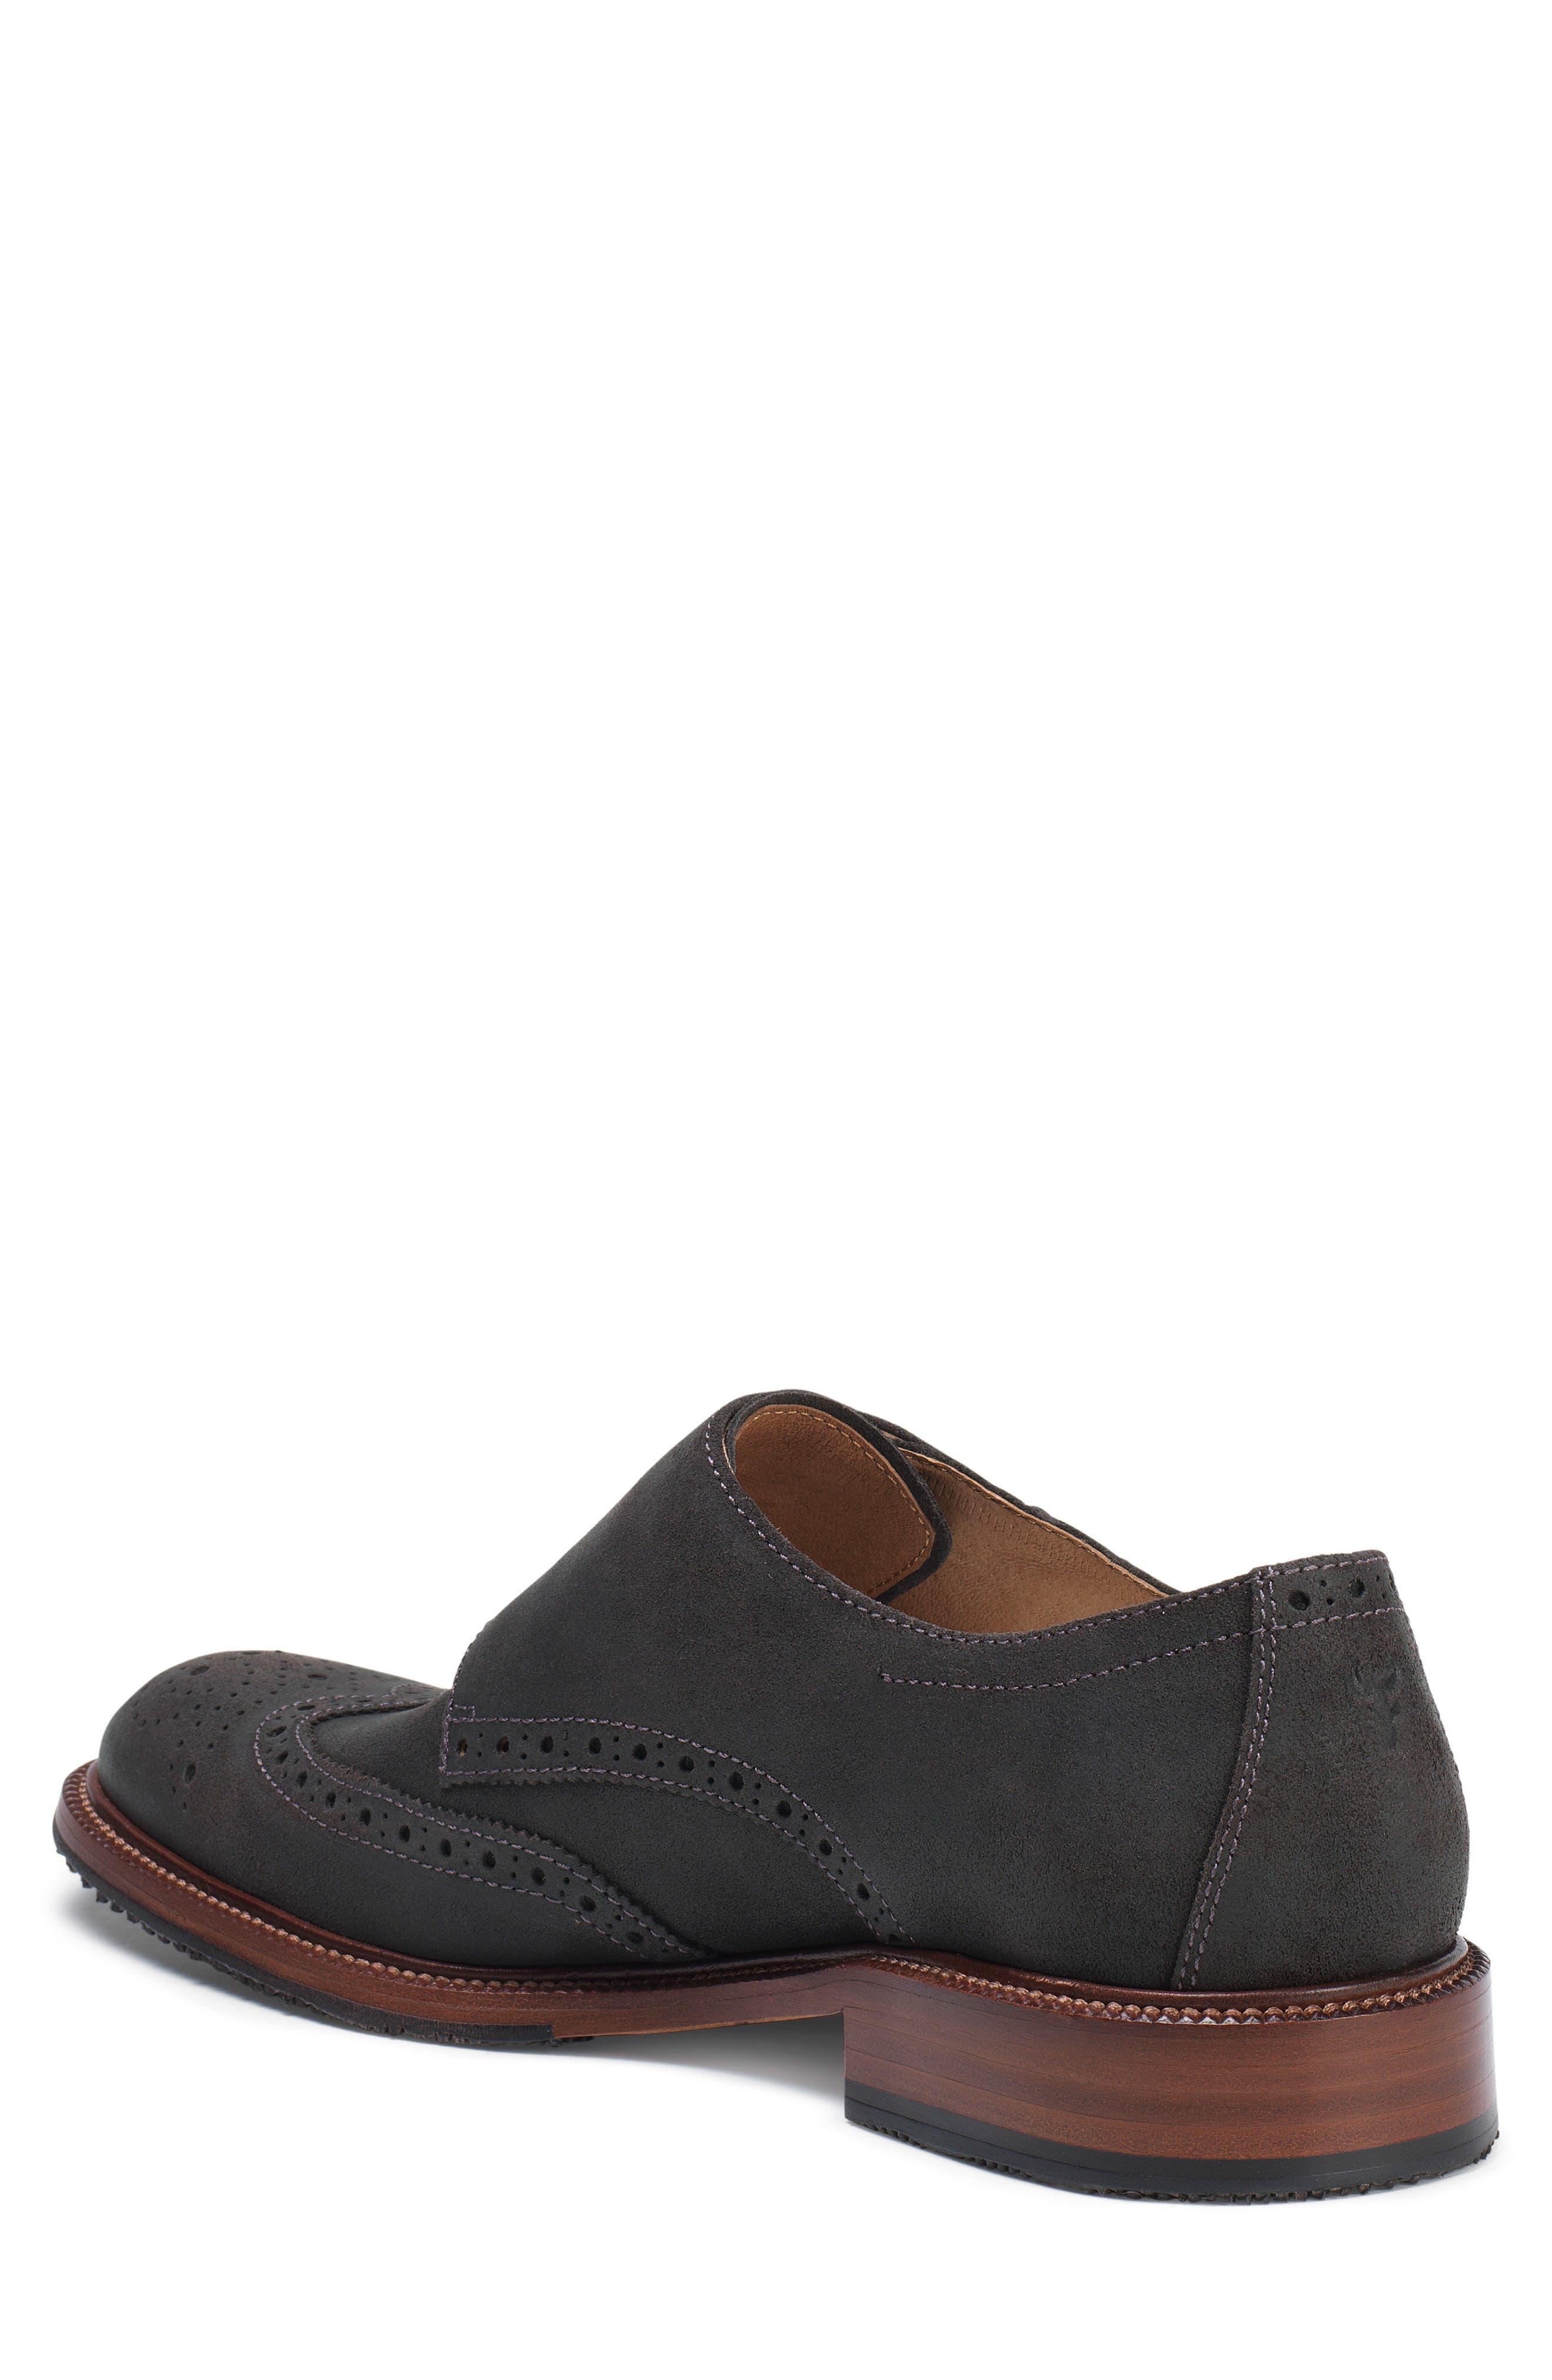 Leland Double Monk Strap Shoe,                             Alternate thumbnail 2, color,                             GRAY WAXED SUEDE